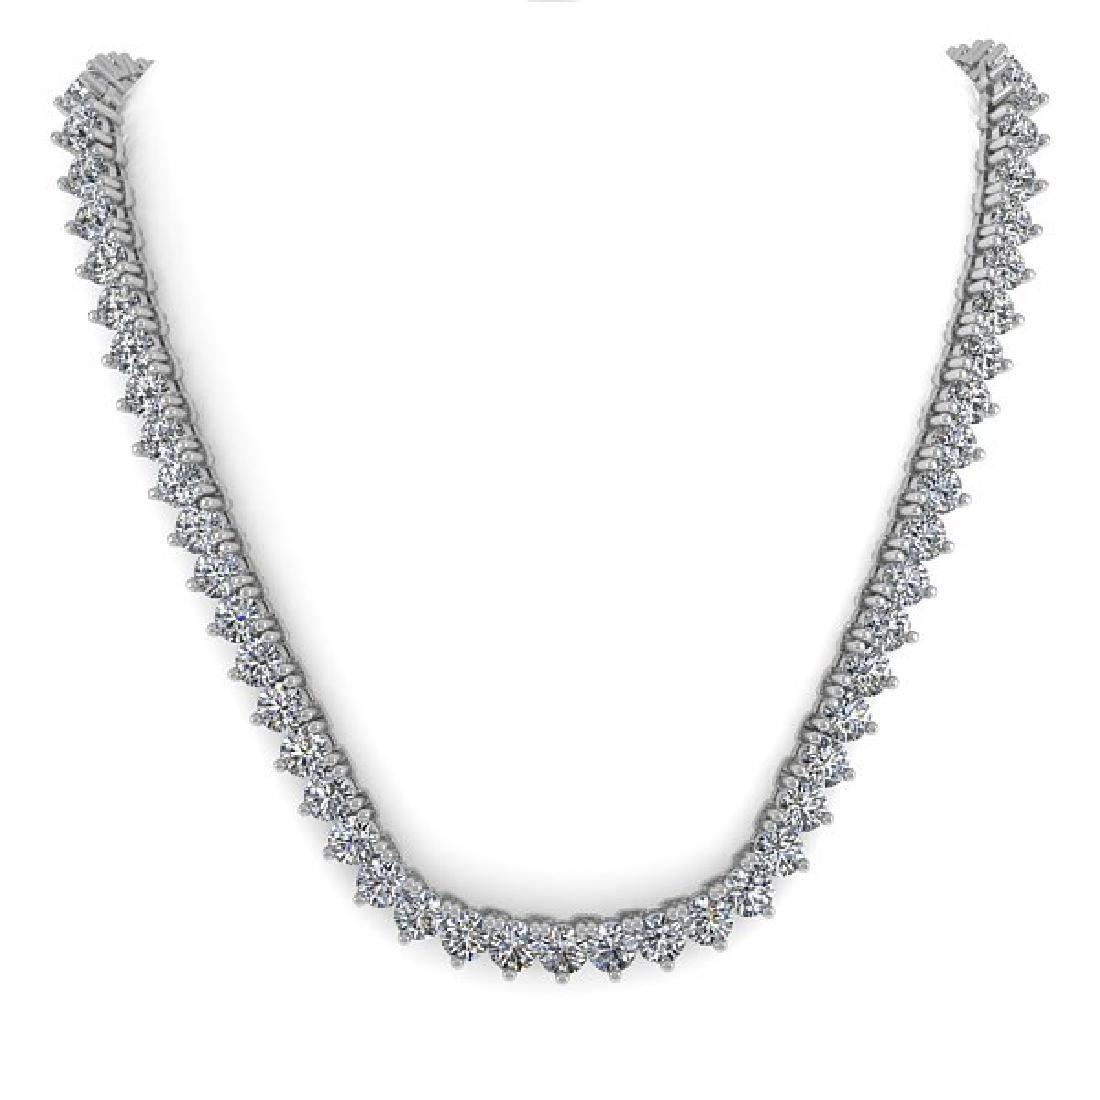 25 CTW Solitaire VS/SI Diamond Necklace 18K White Gold - 3